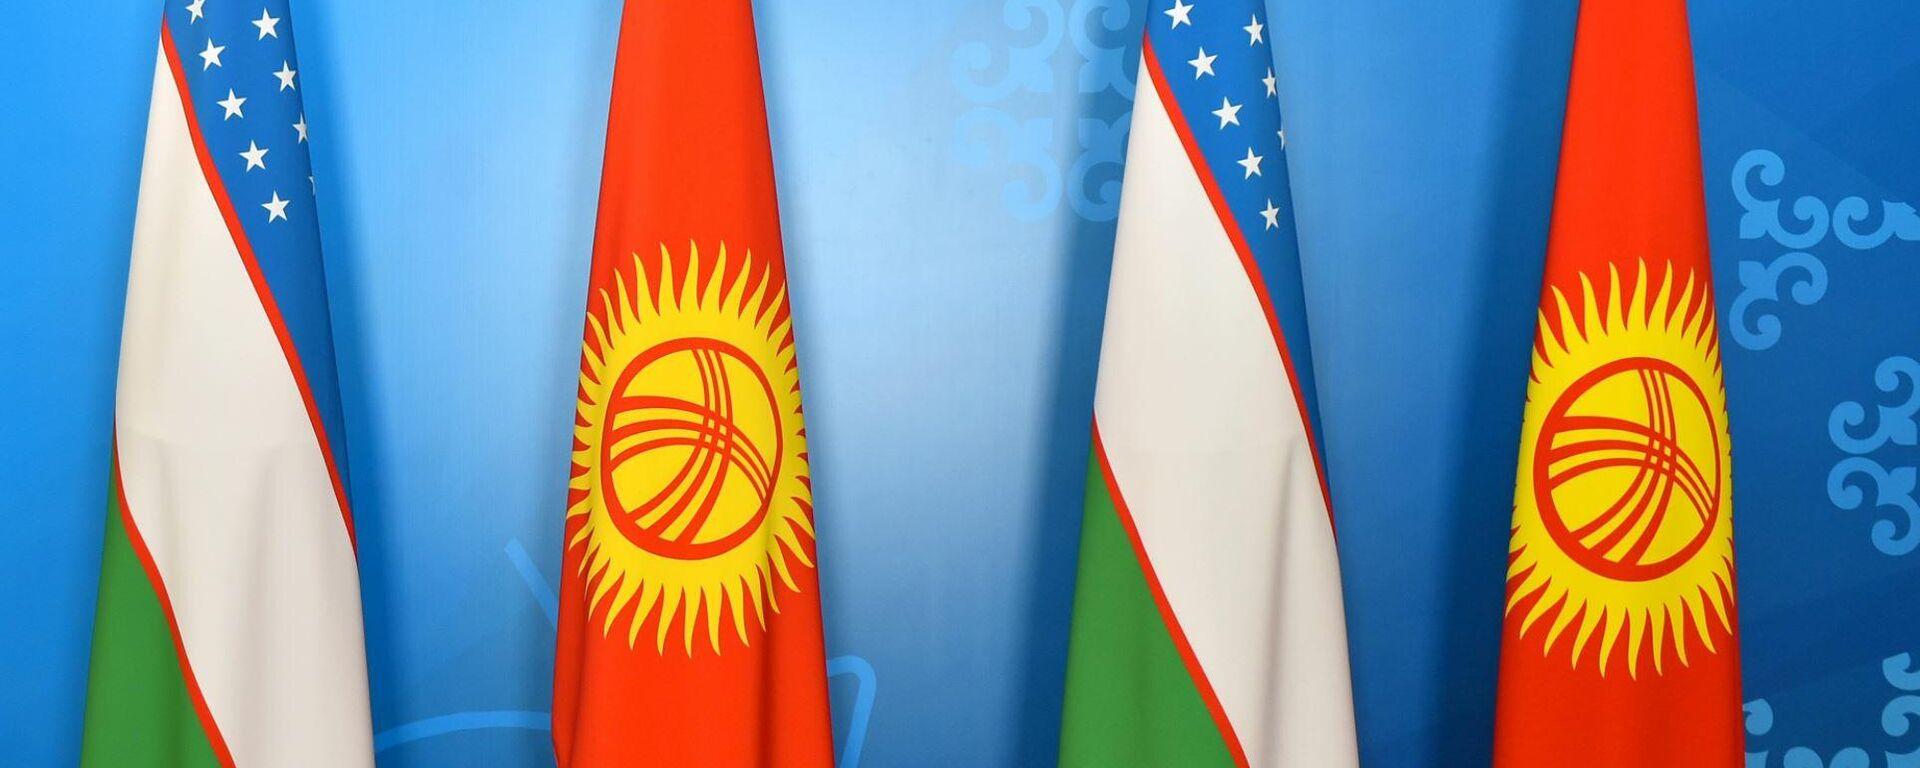 Флаги Узбекистана и Кыргызстана - Sputnik Ўзбекистон, 1920, 18.08.2021